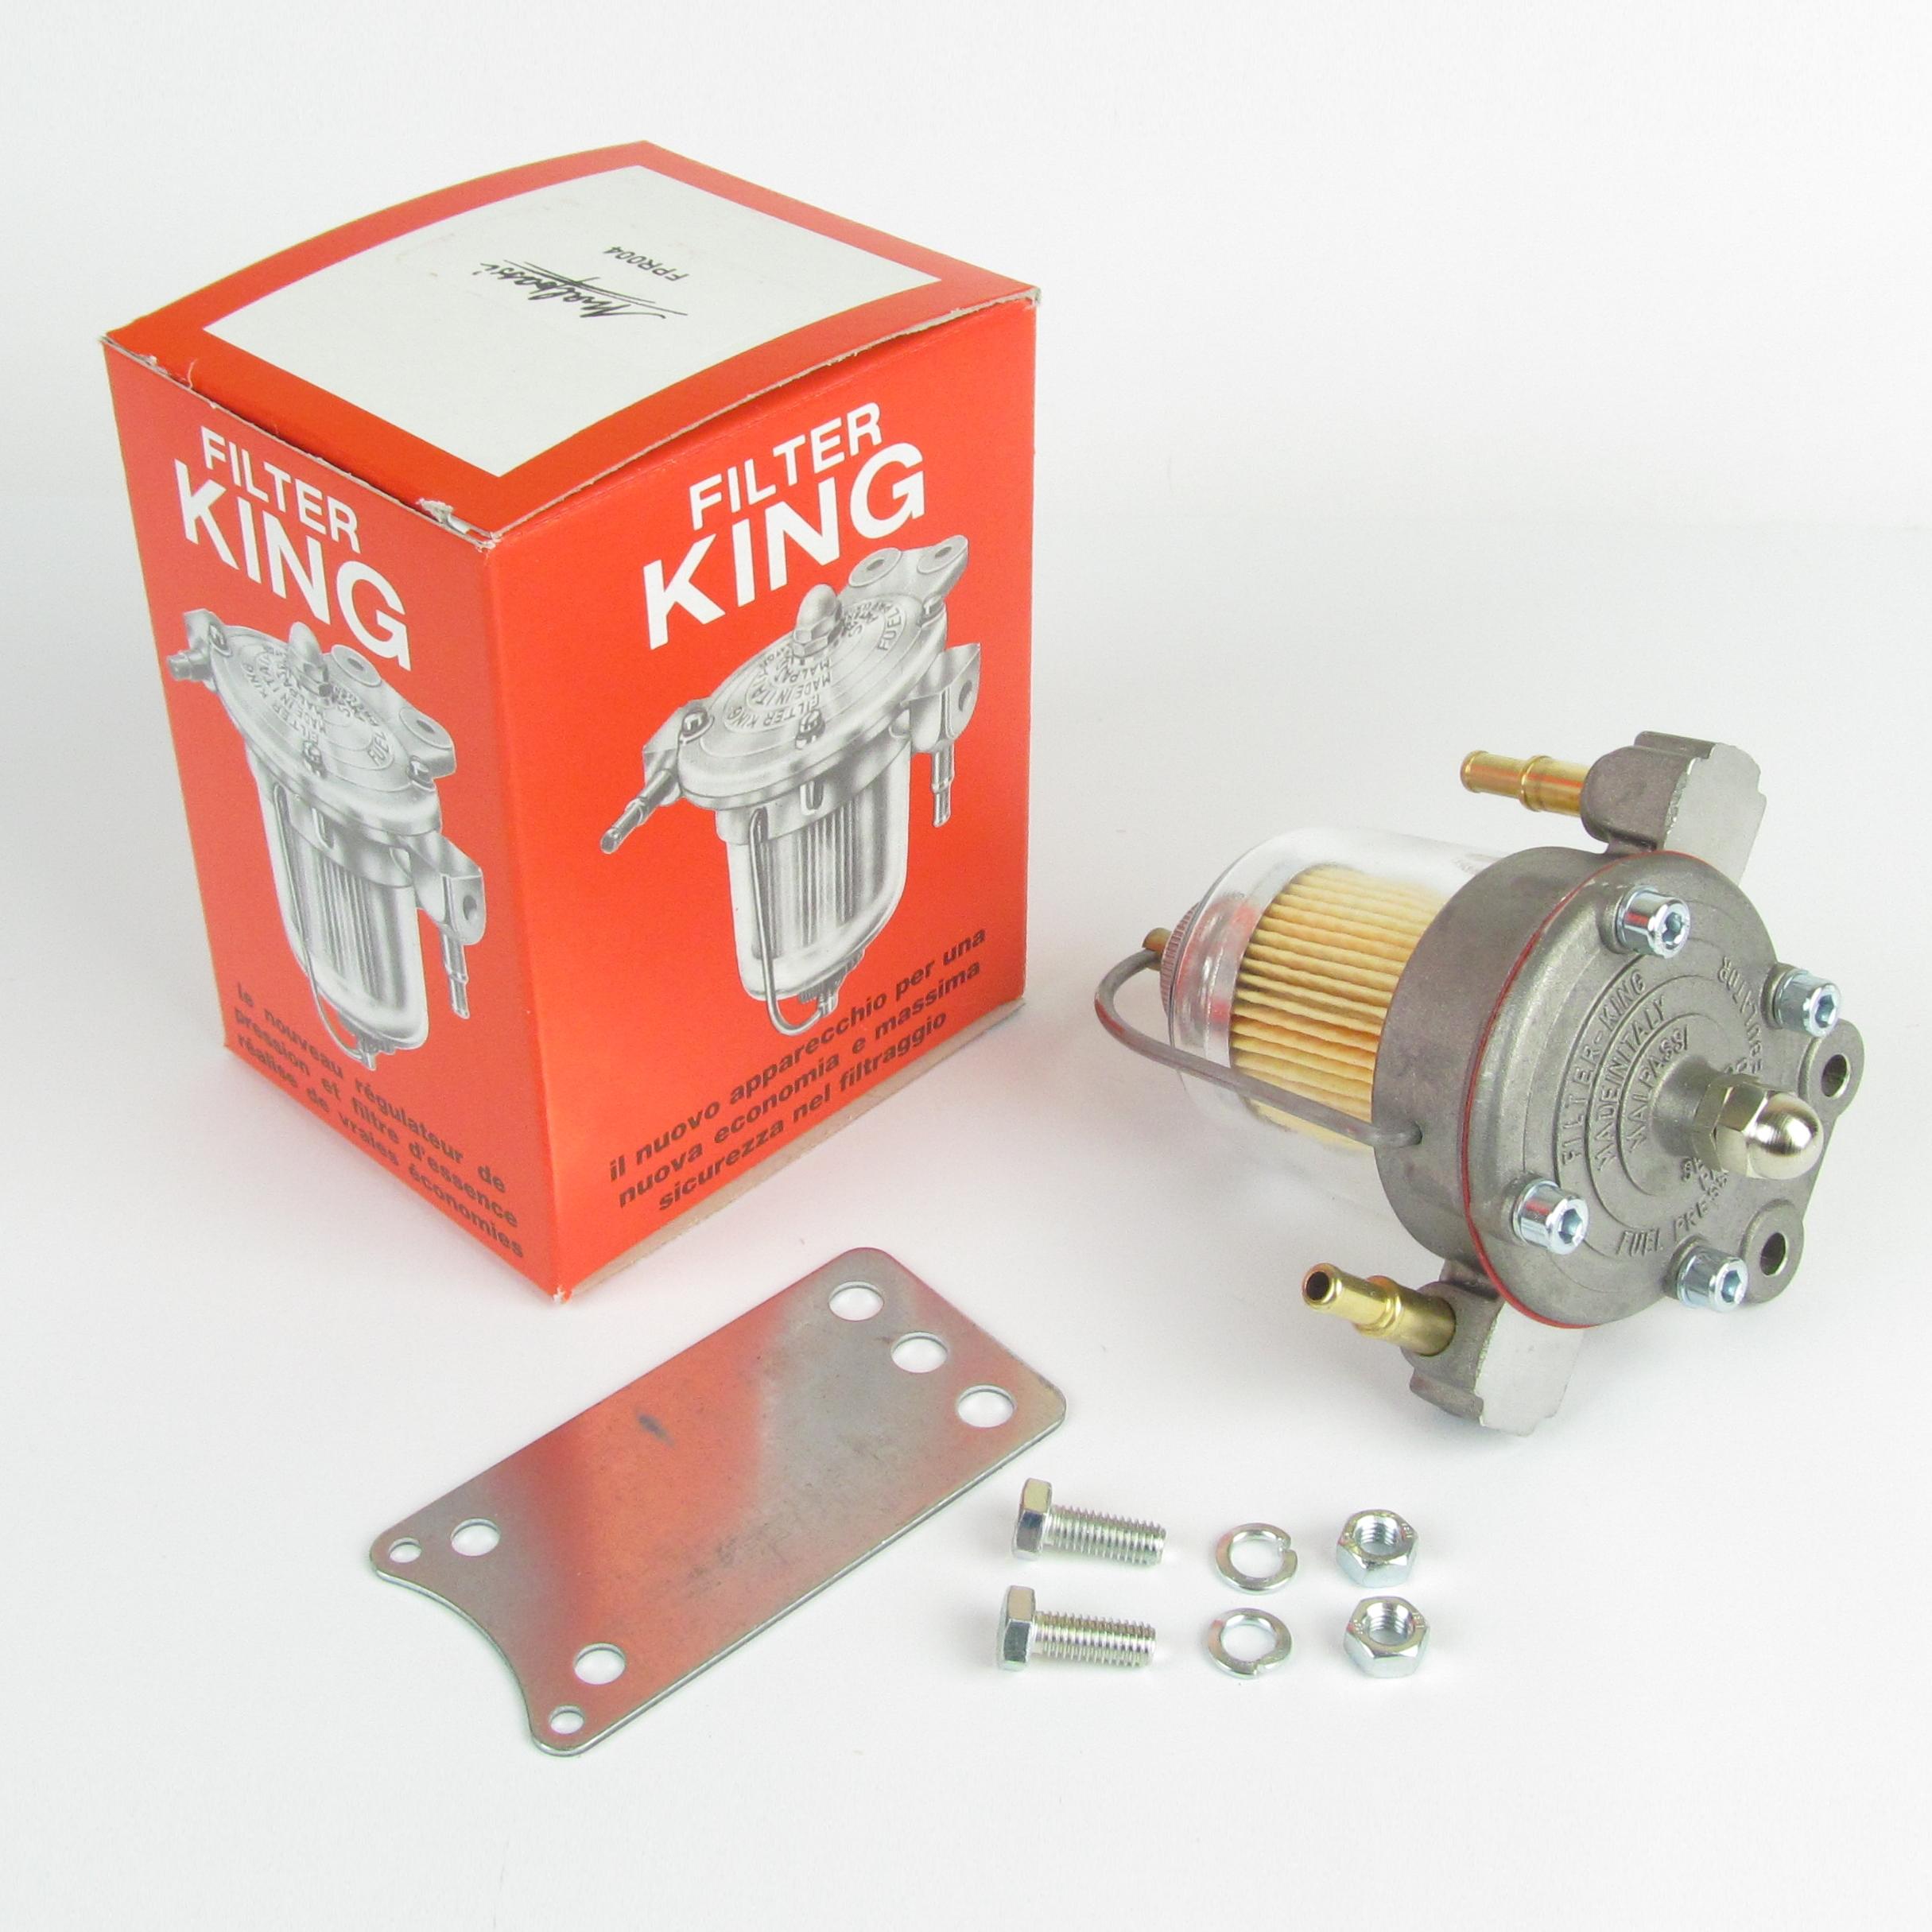 Malpassi Filter King Fuel Pressure Regulator Instructions 1988 Ford Grant Filters 67mm Eurocarb Barry